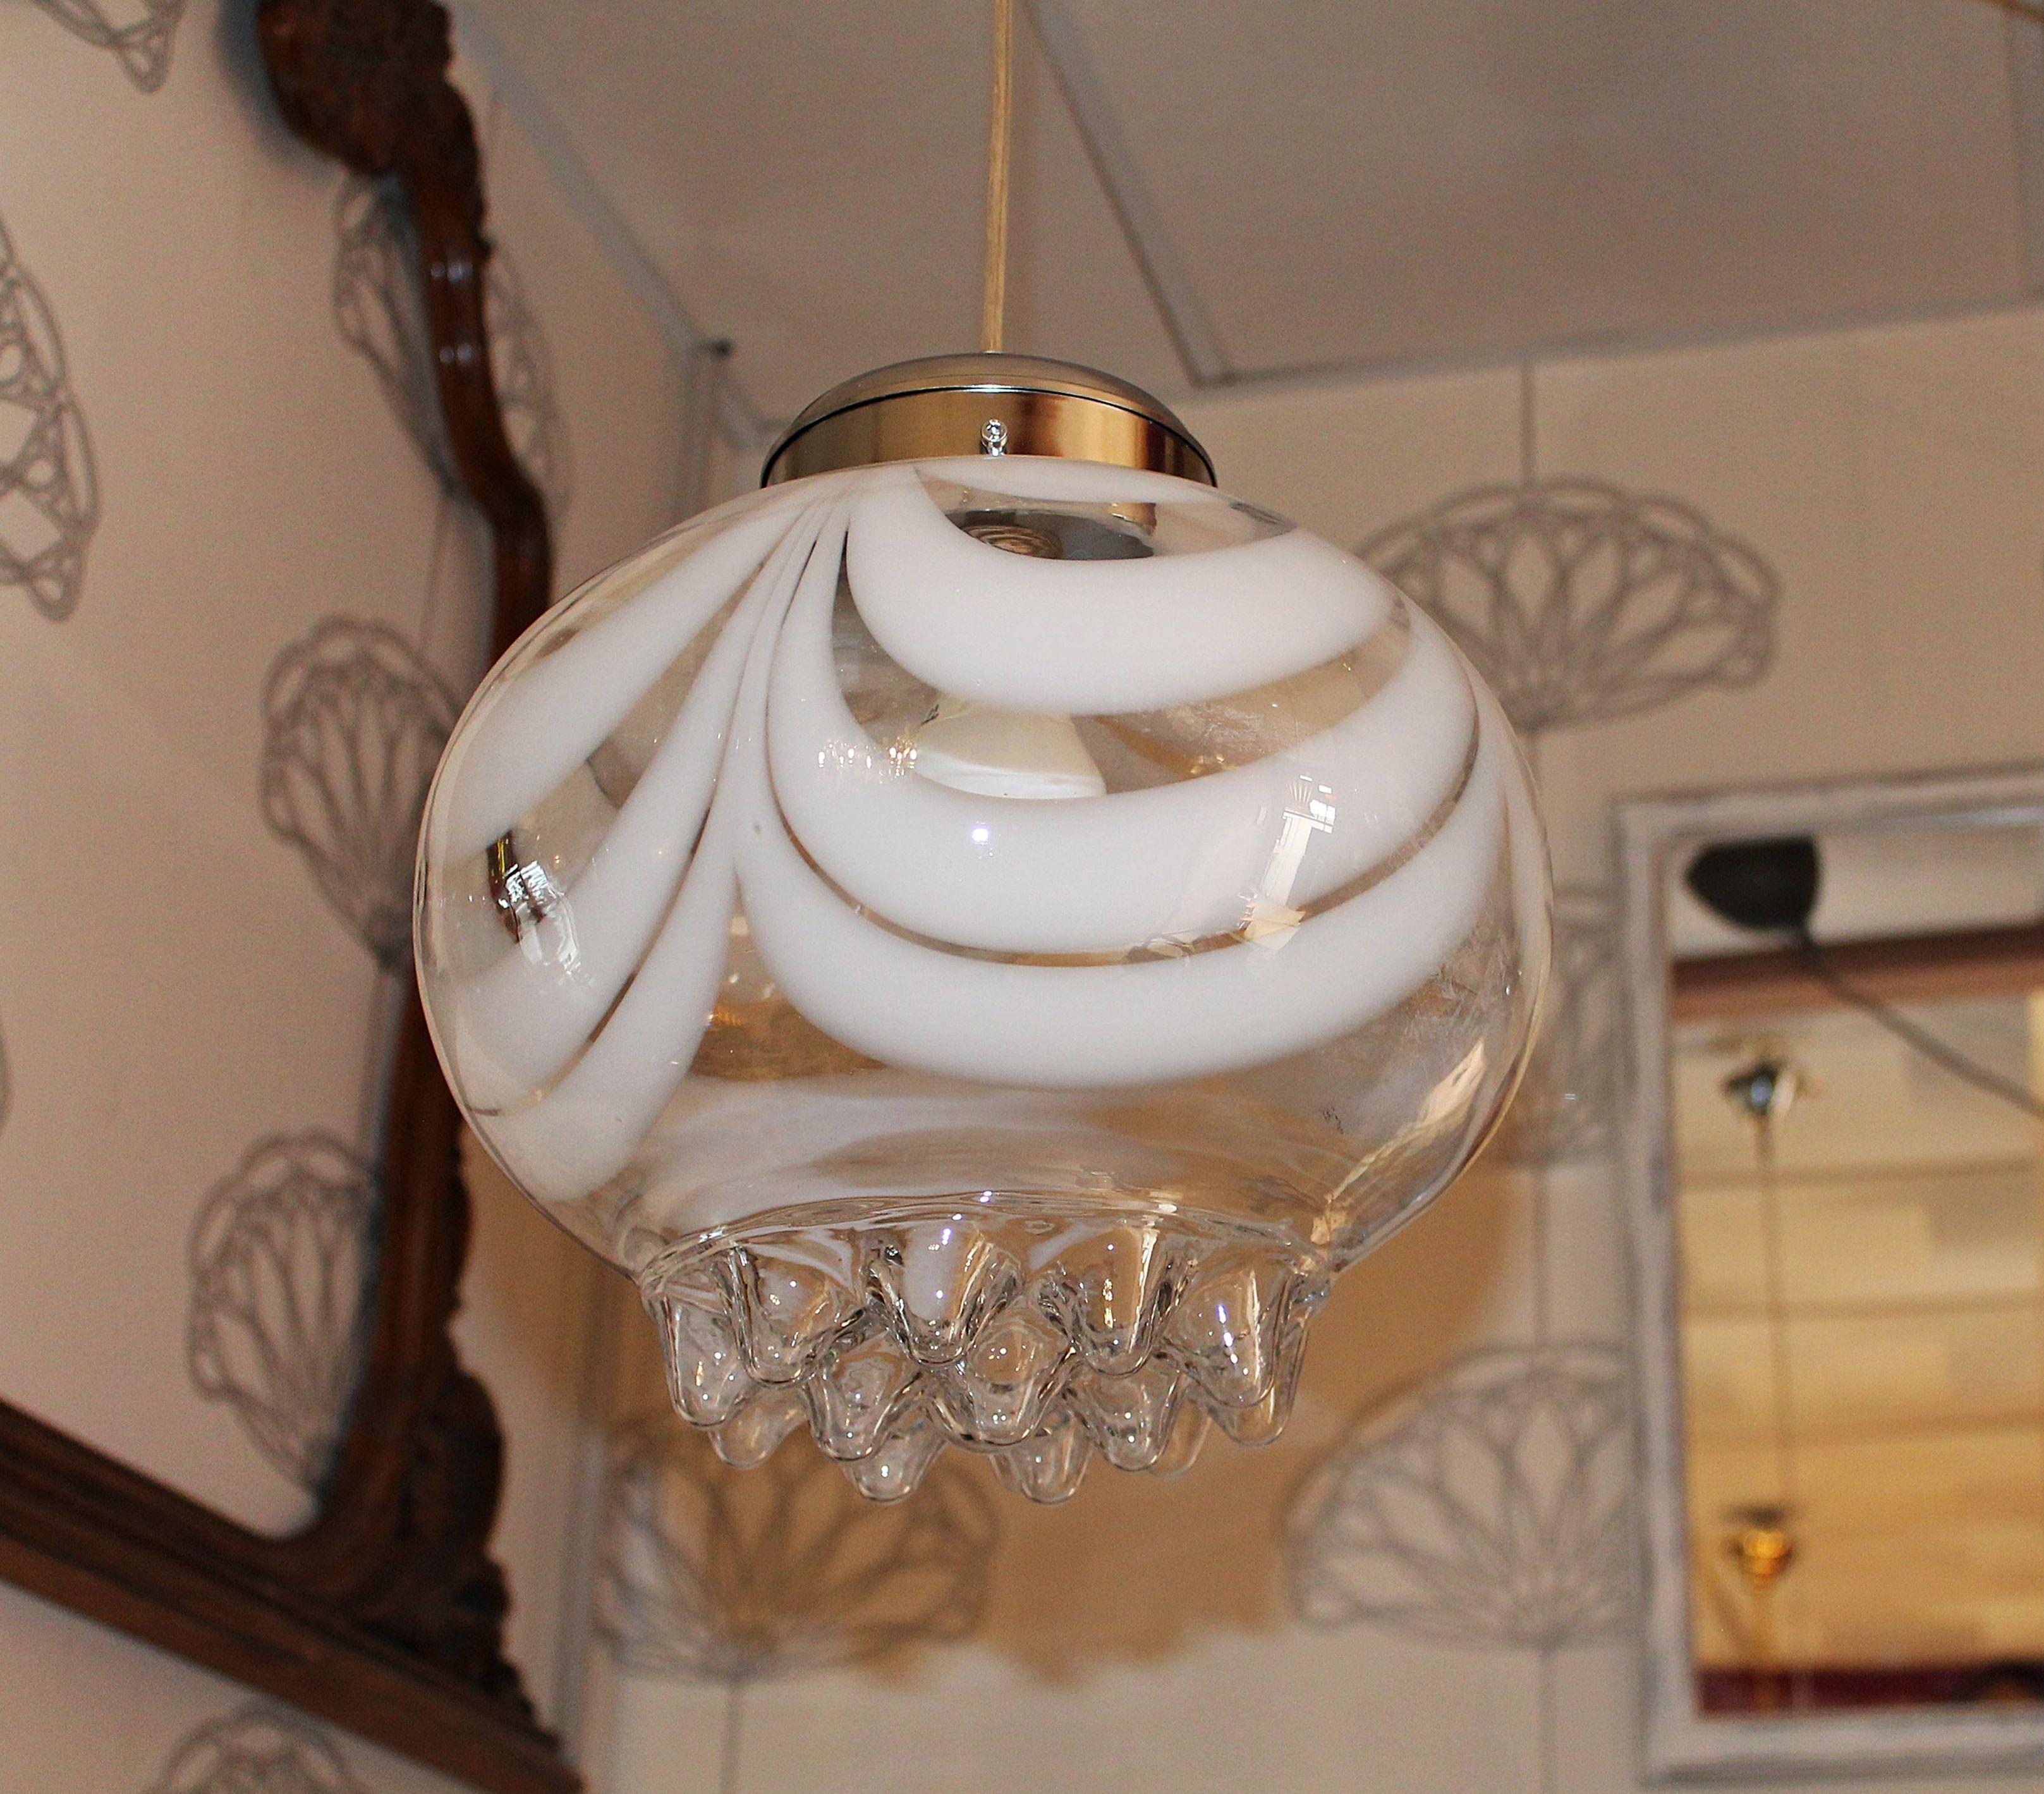 LAMPARA DE CRISTAL MAZZEGA EN VALENCIA